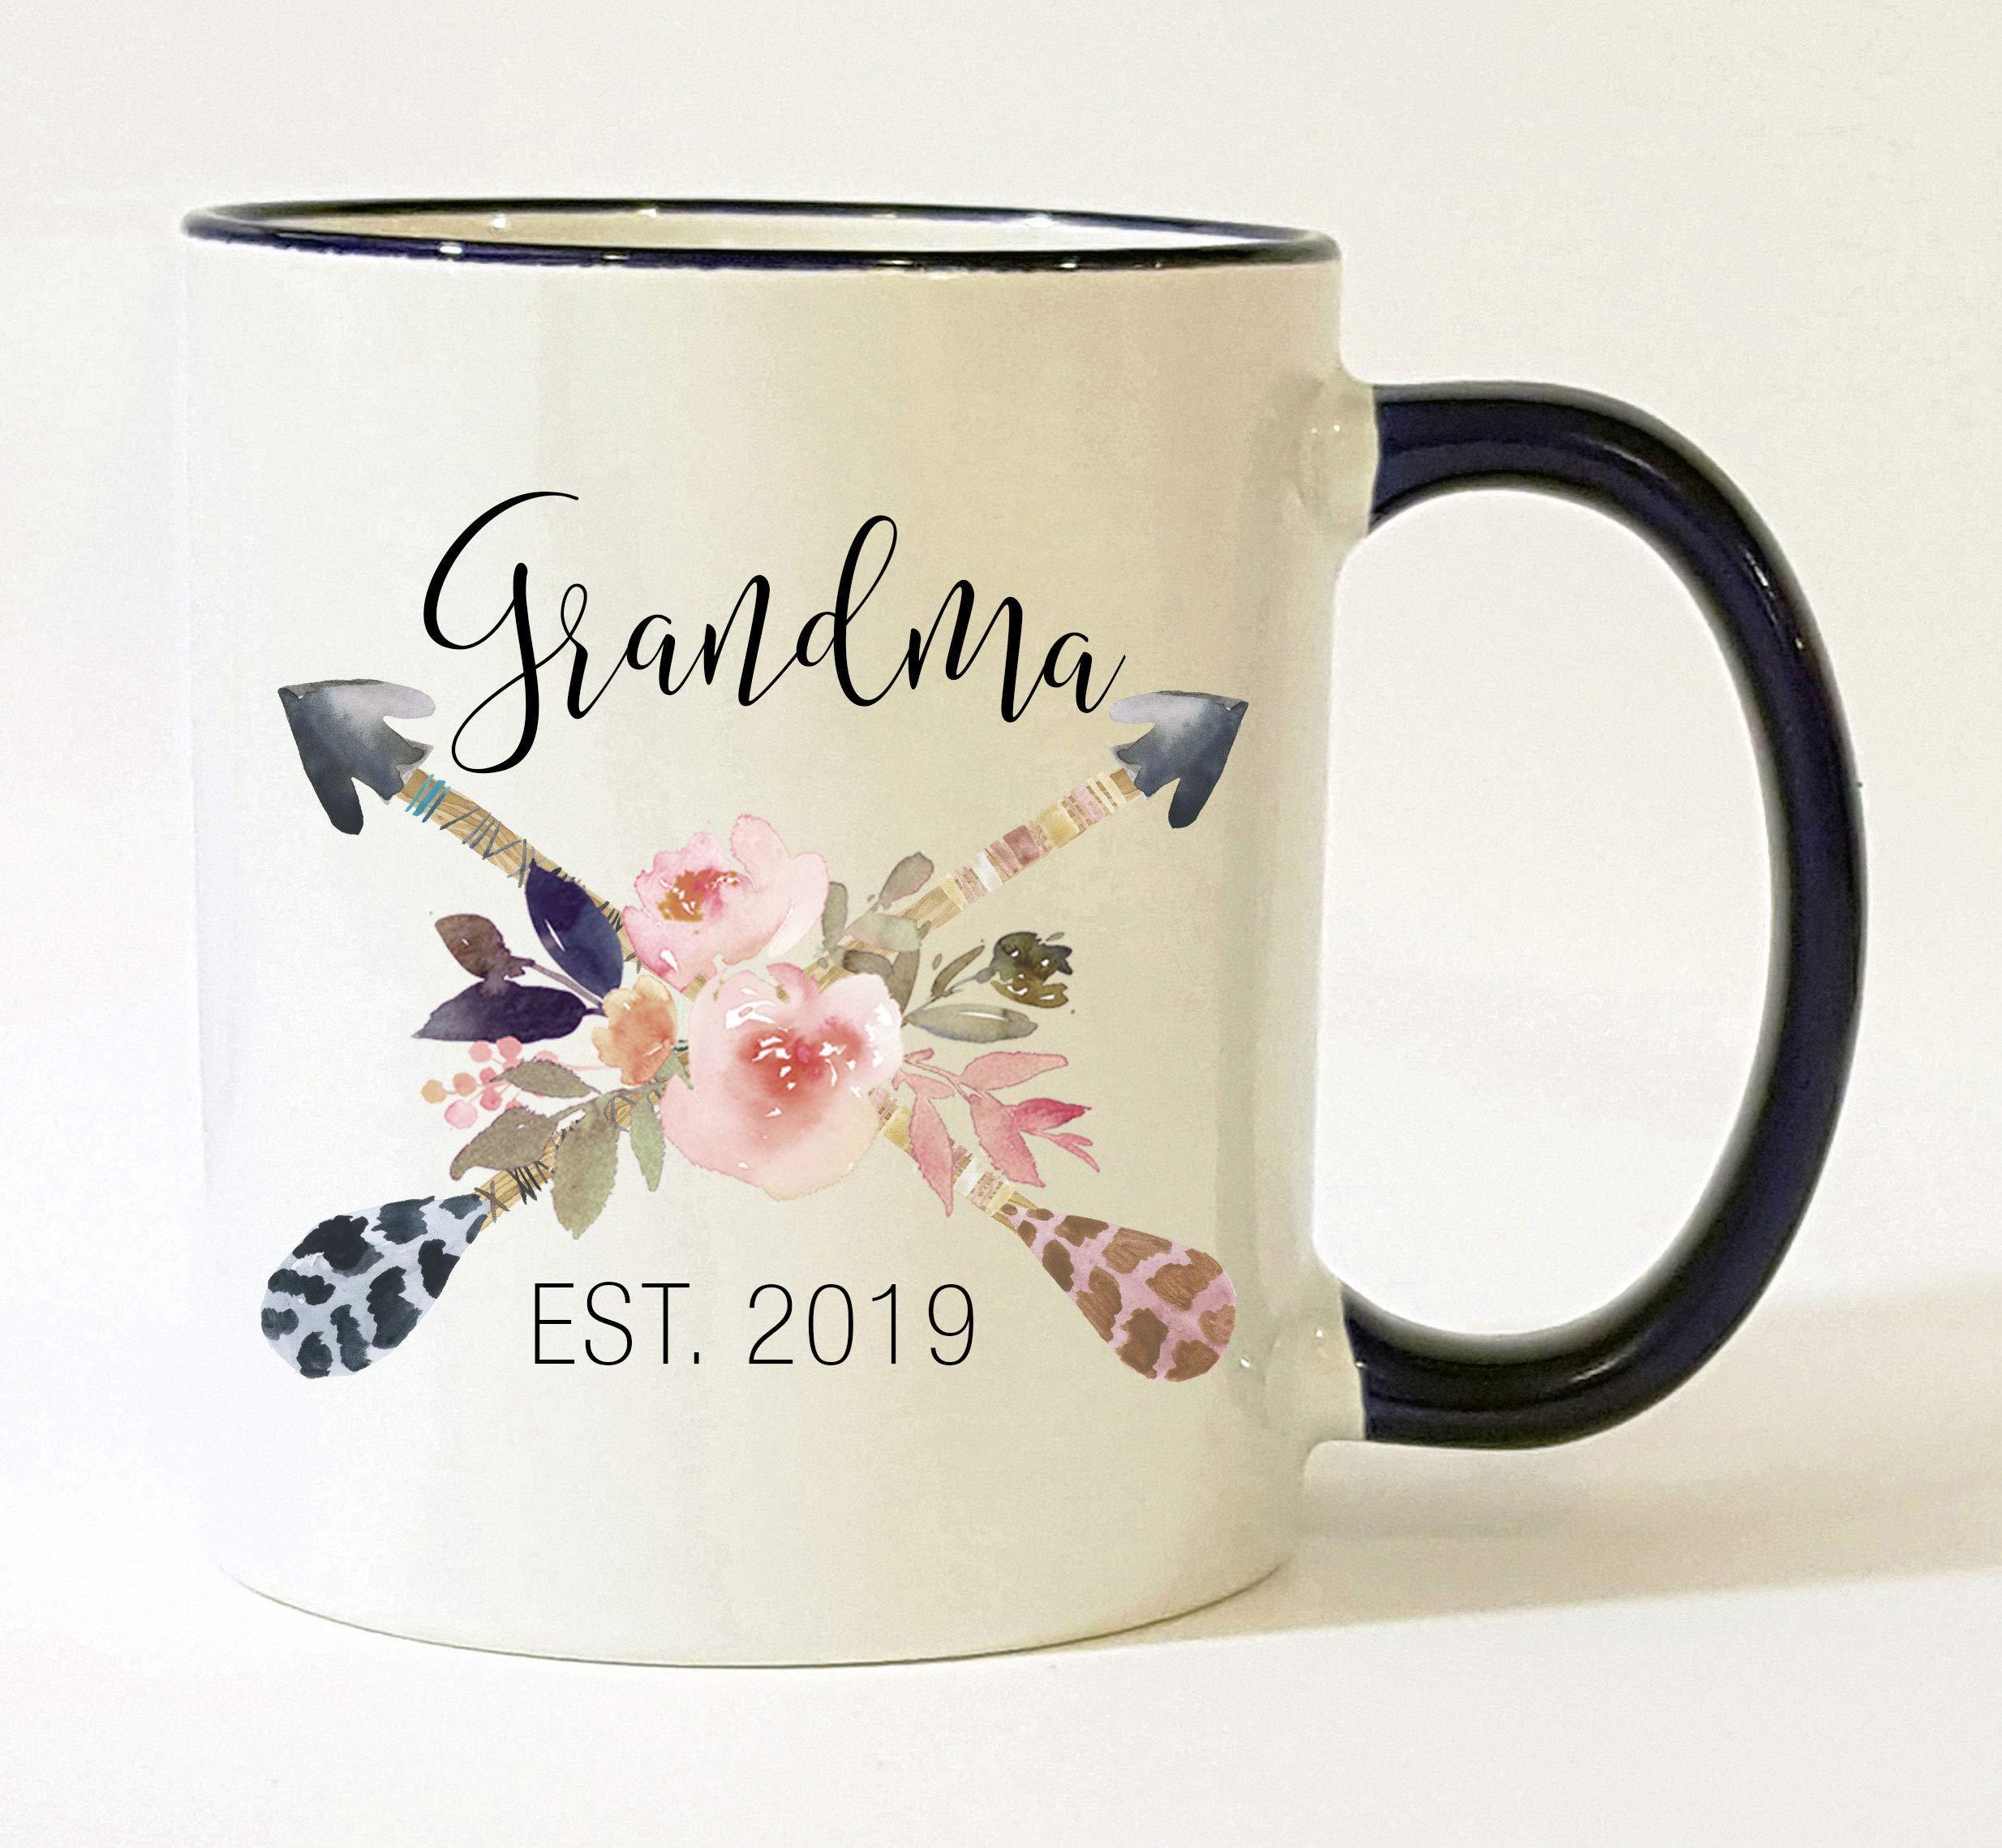 Grandma Est 2019 Mug Pregnancy Announcement 2019